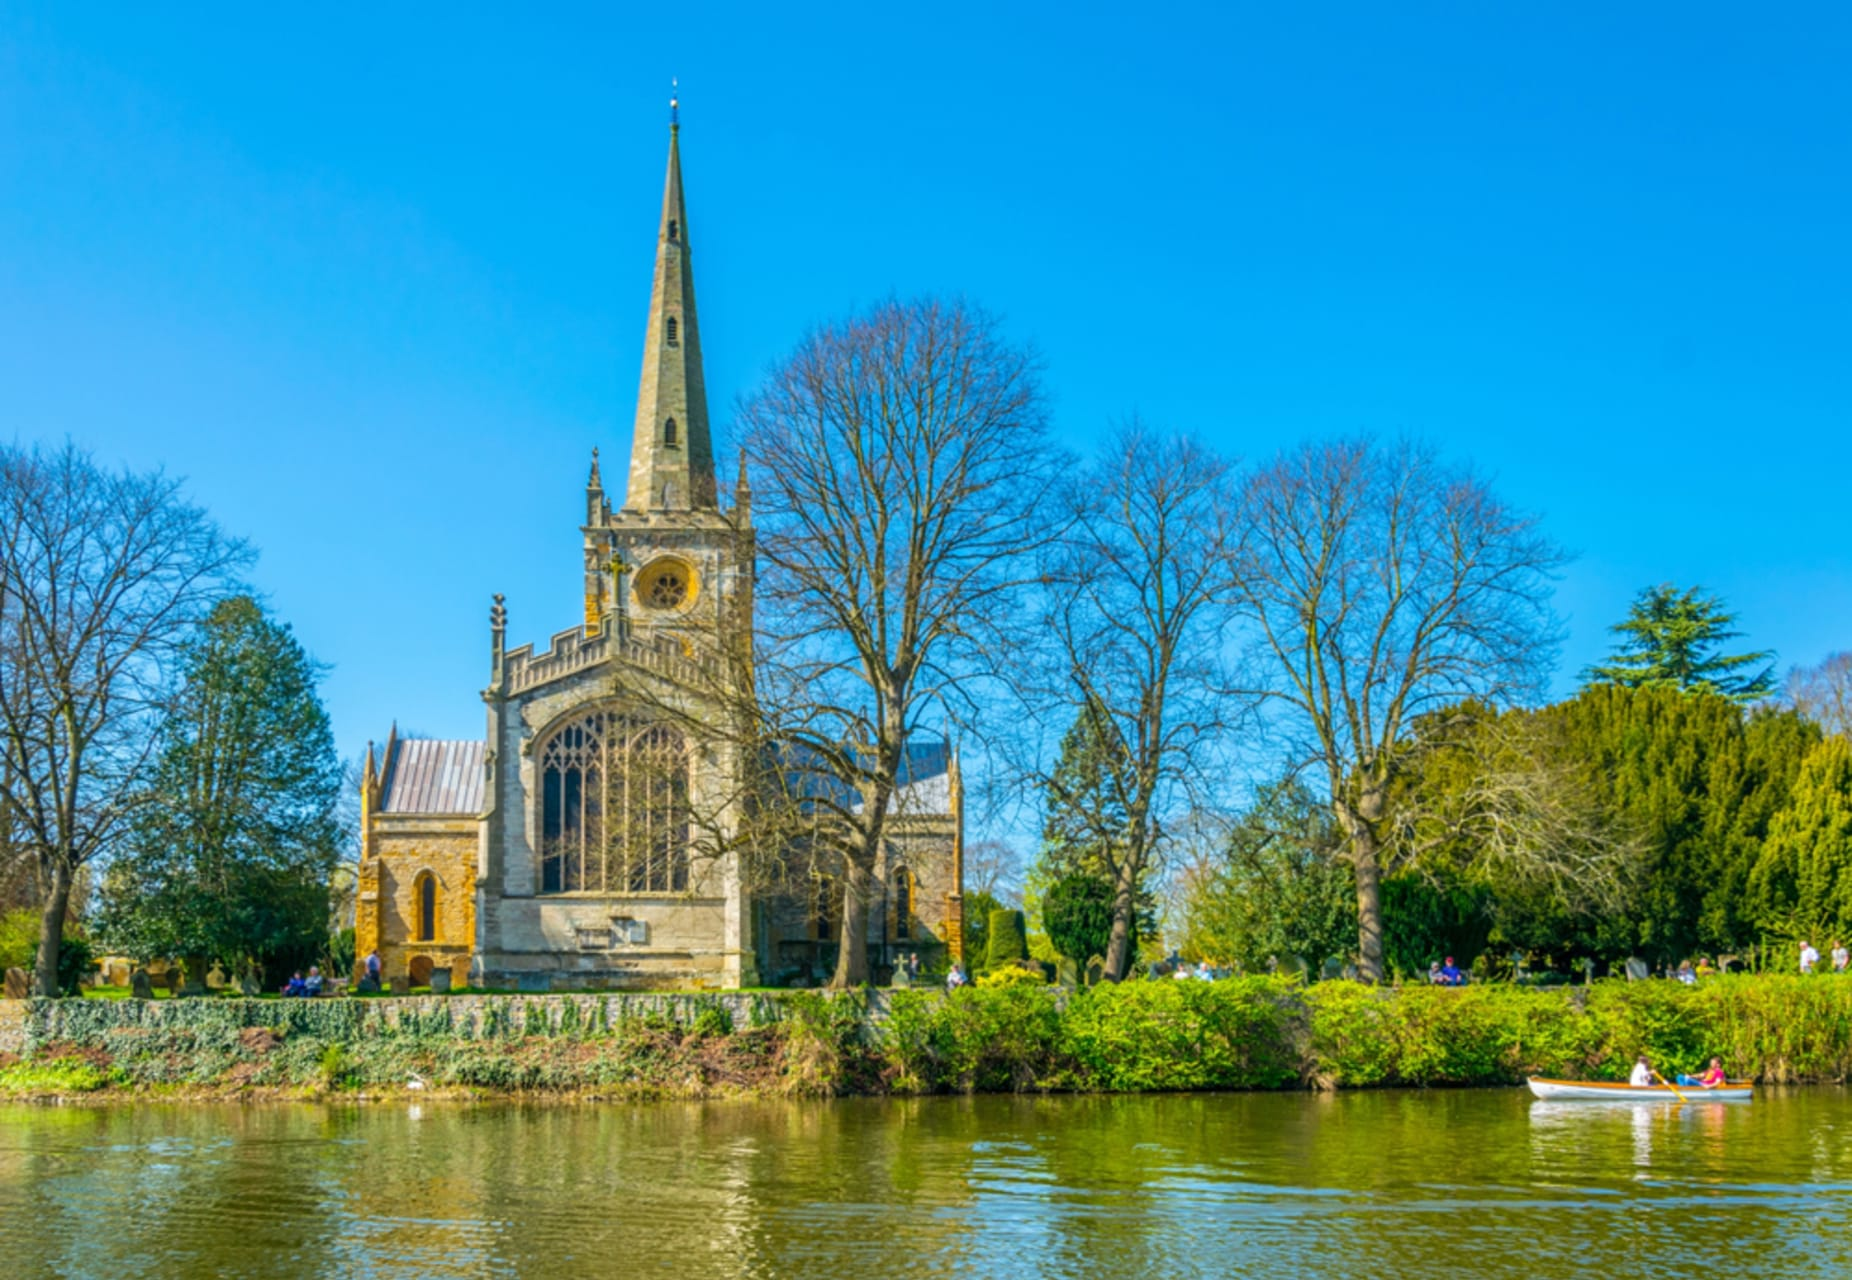 Stratford-upon-Avon - Stratford - 800 Years Along the Avon